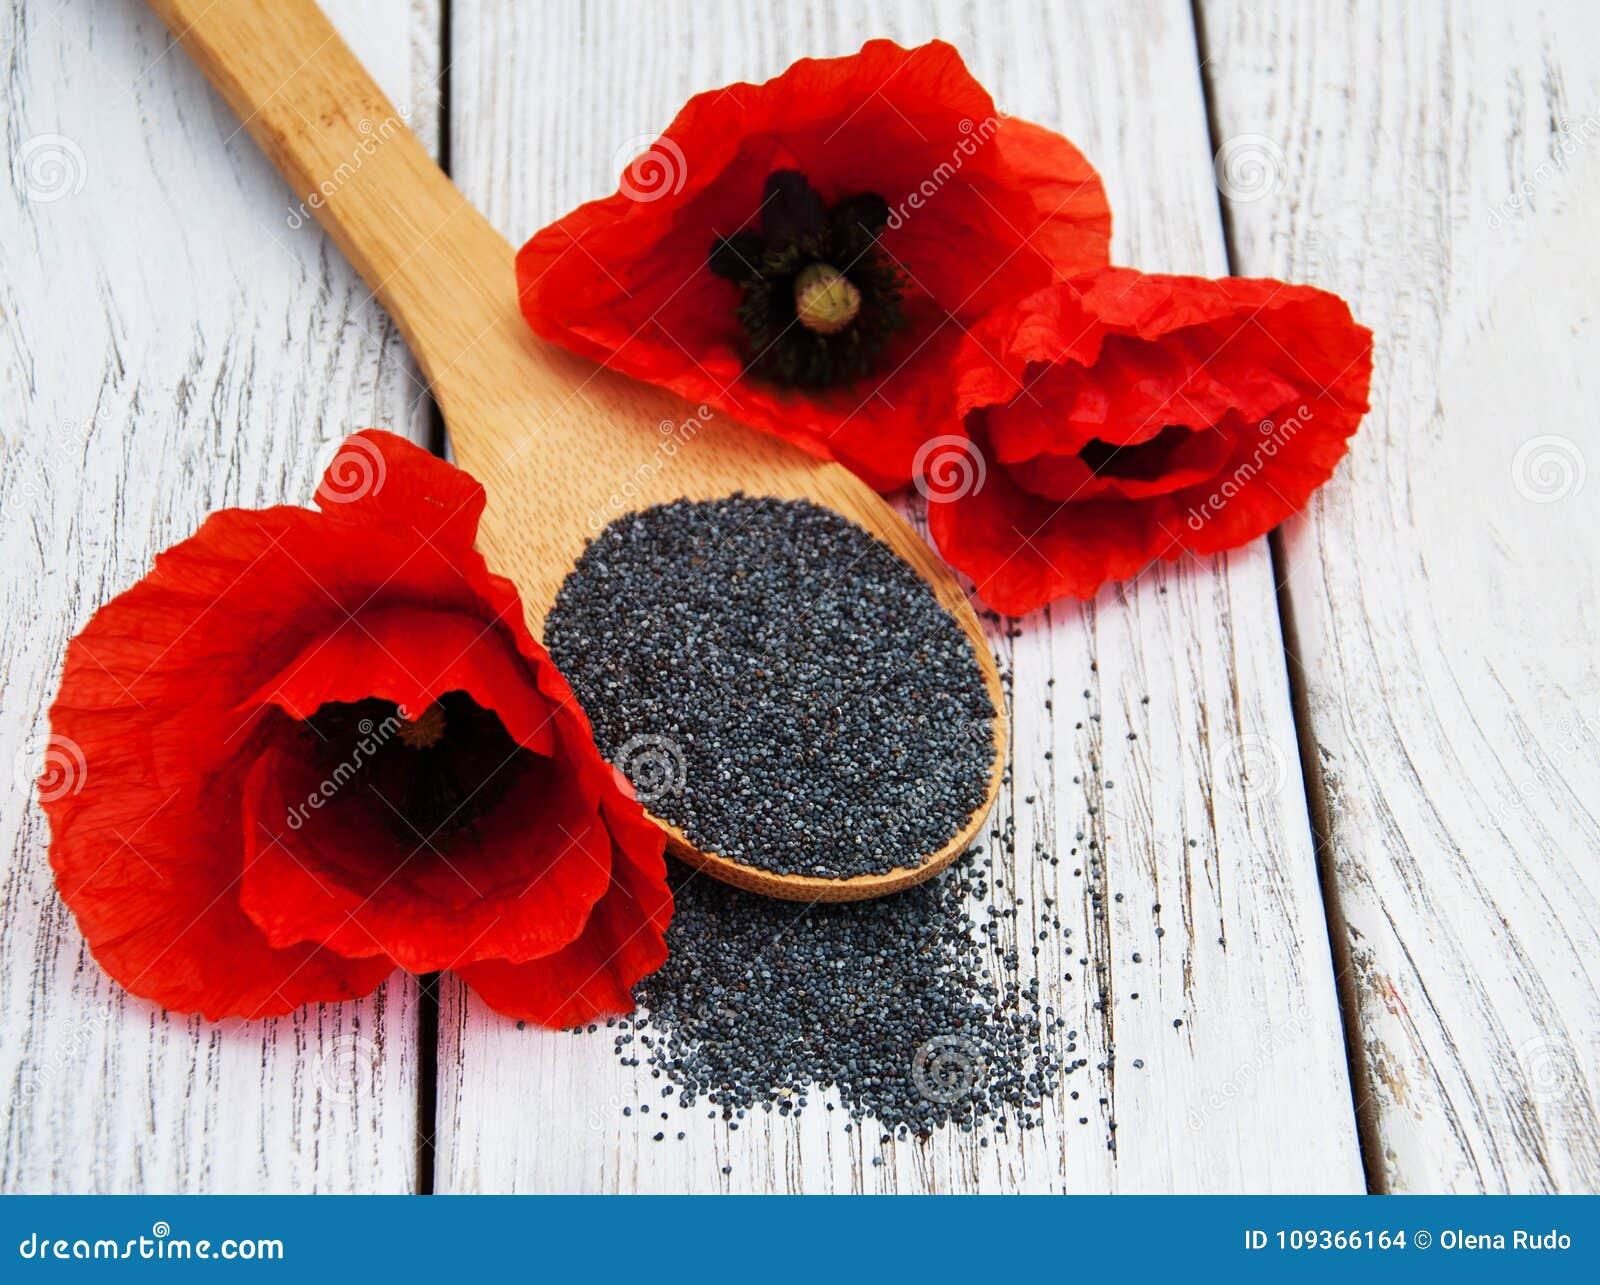 Poppy seeds and flowers stock photo image of eating 109366164 download poppy seeds and flowers stock photo image of eating 109366164 mightylinksfo